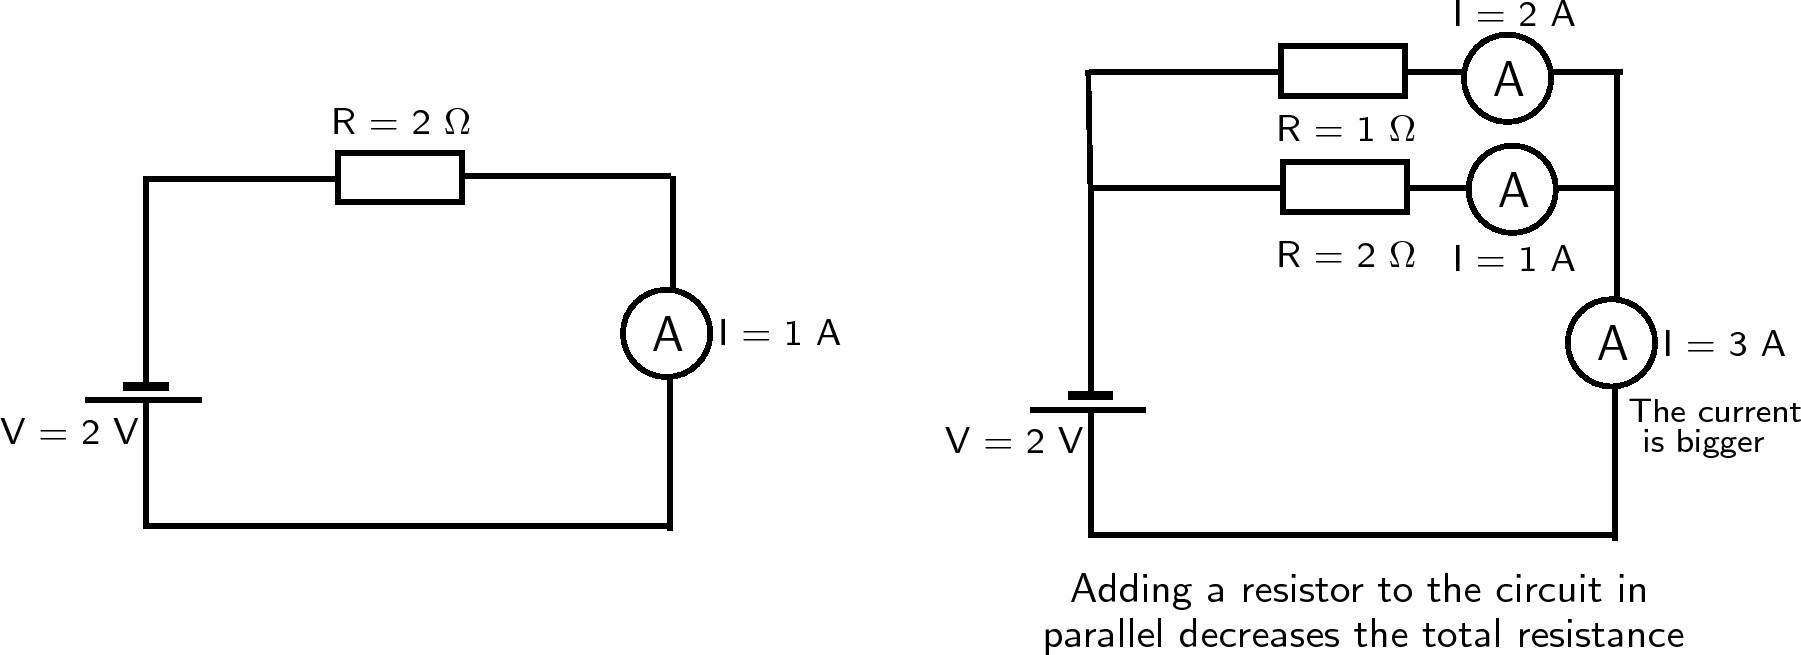 wiring diagram maker inspirational wiring diagram image rh mainetreasurechest com Physics Circuit Diagram Tutorial Parallel and Series Circuits